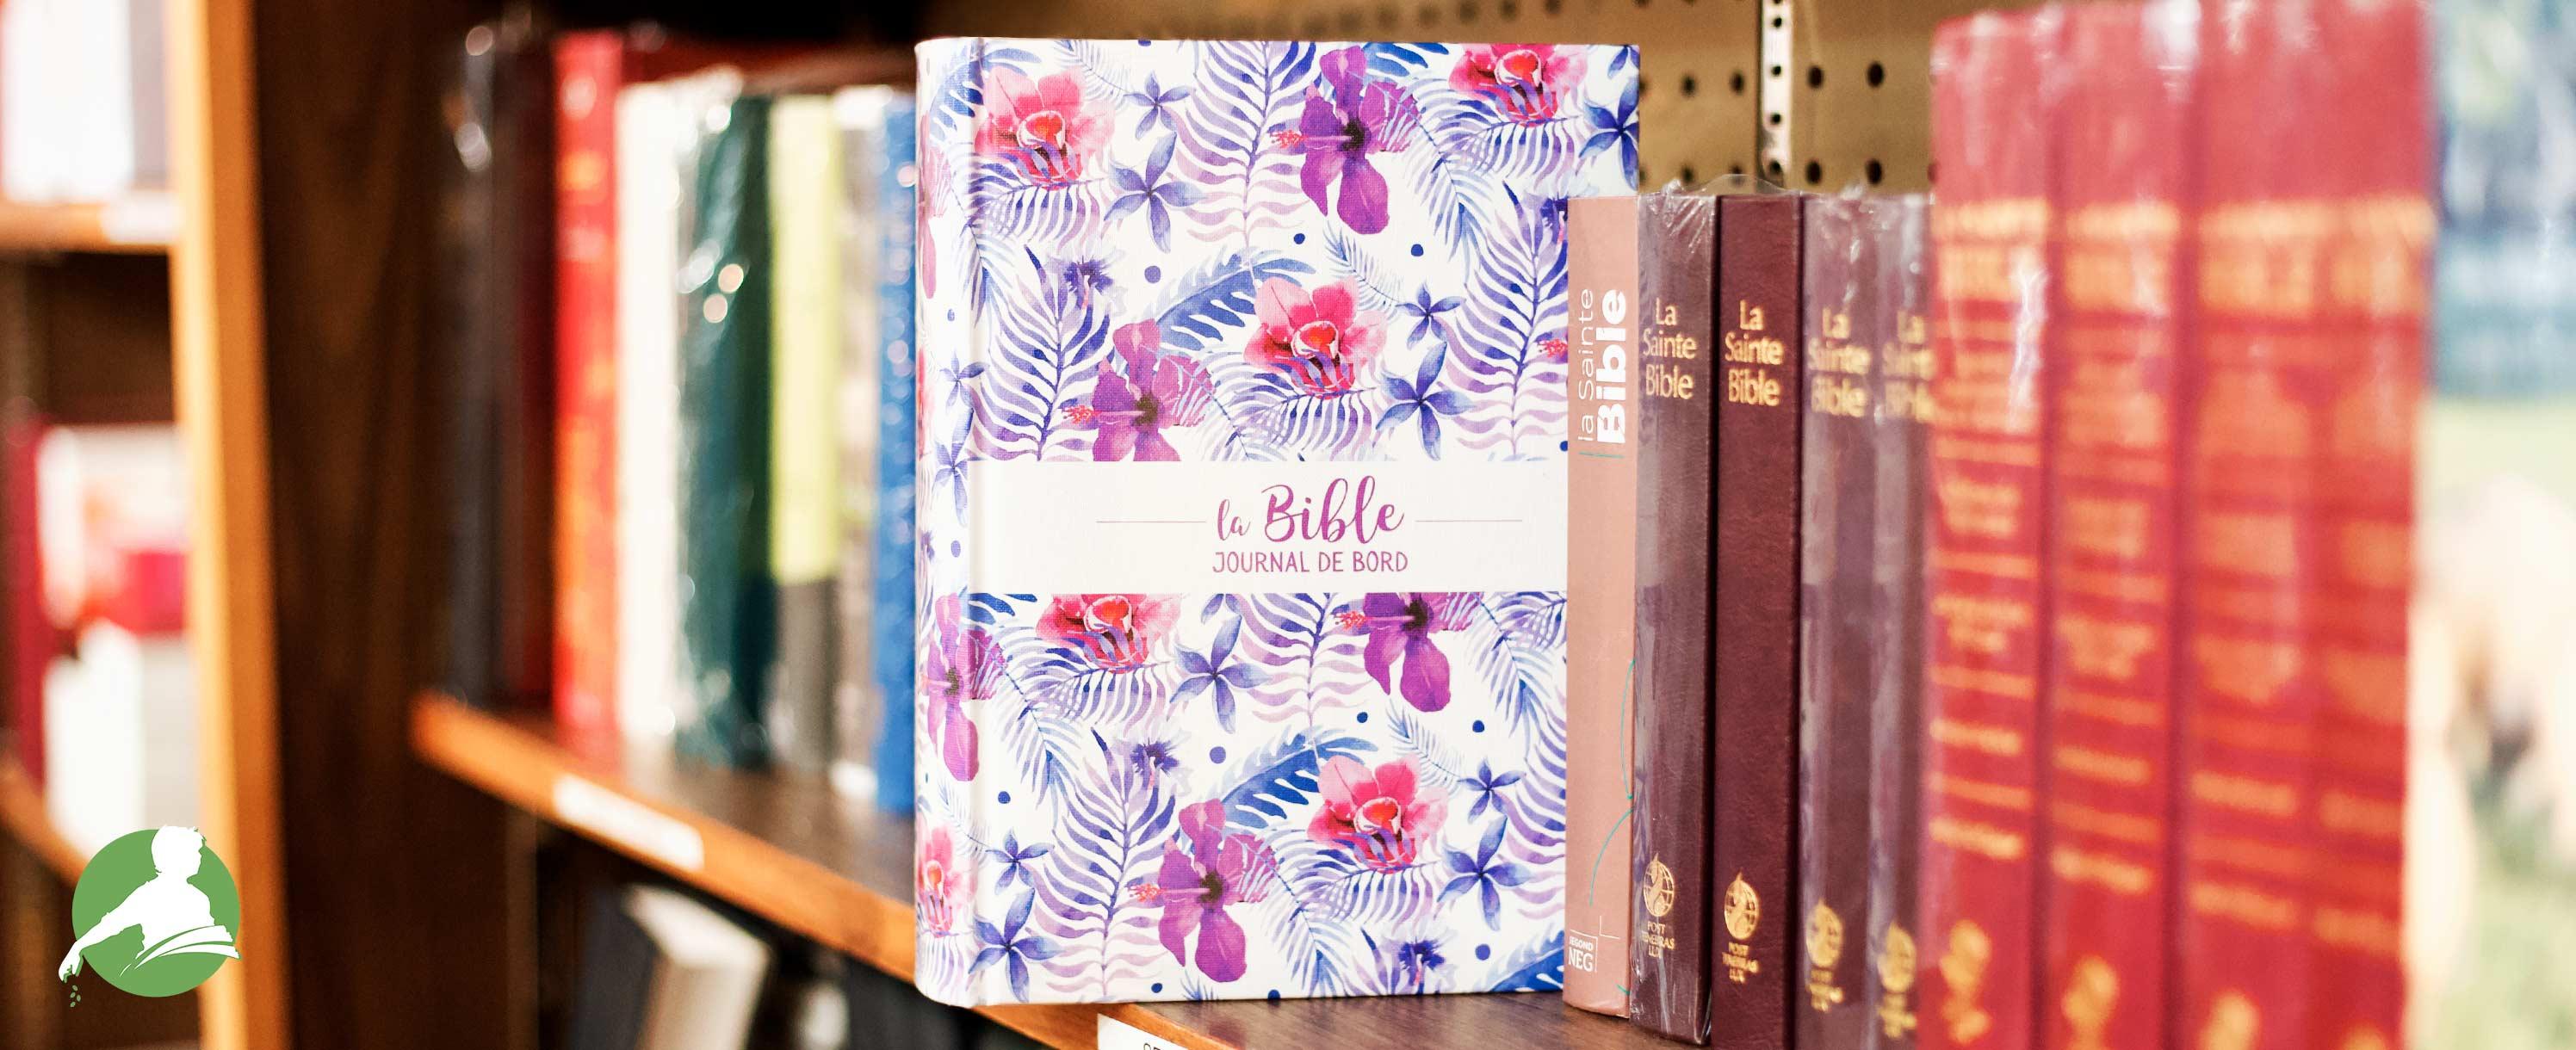 Bible journal de bord